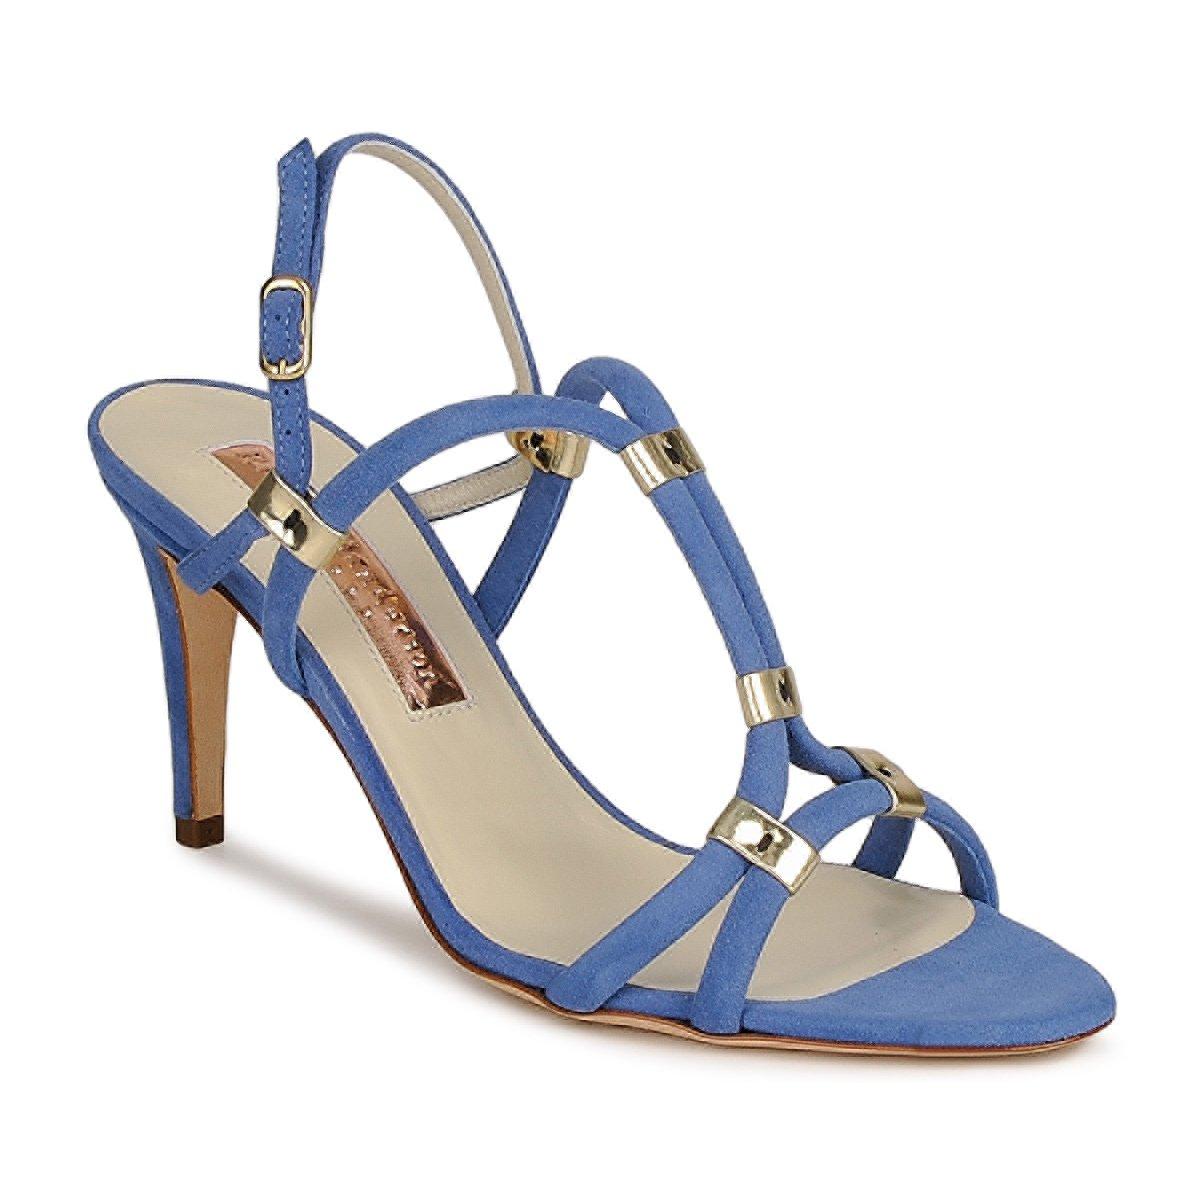 Rupert Sanderson PAPRIKA Rasiago-miro - Kostenloser Versand bei Spartoode ! - Schuhe Sandalen / Sandaletten Damen 214,50 €